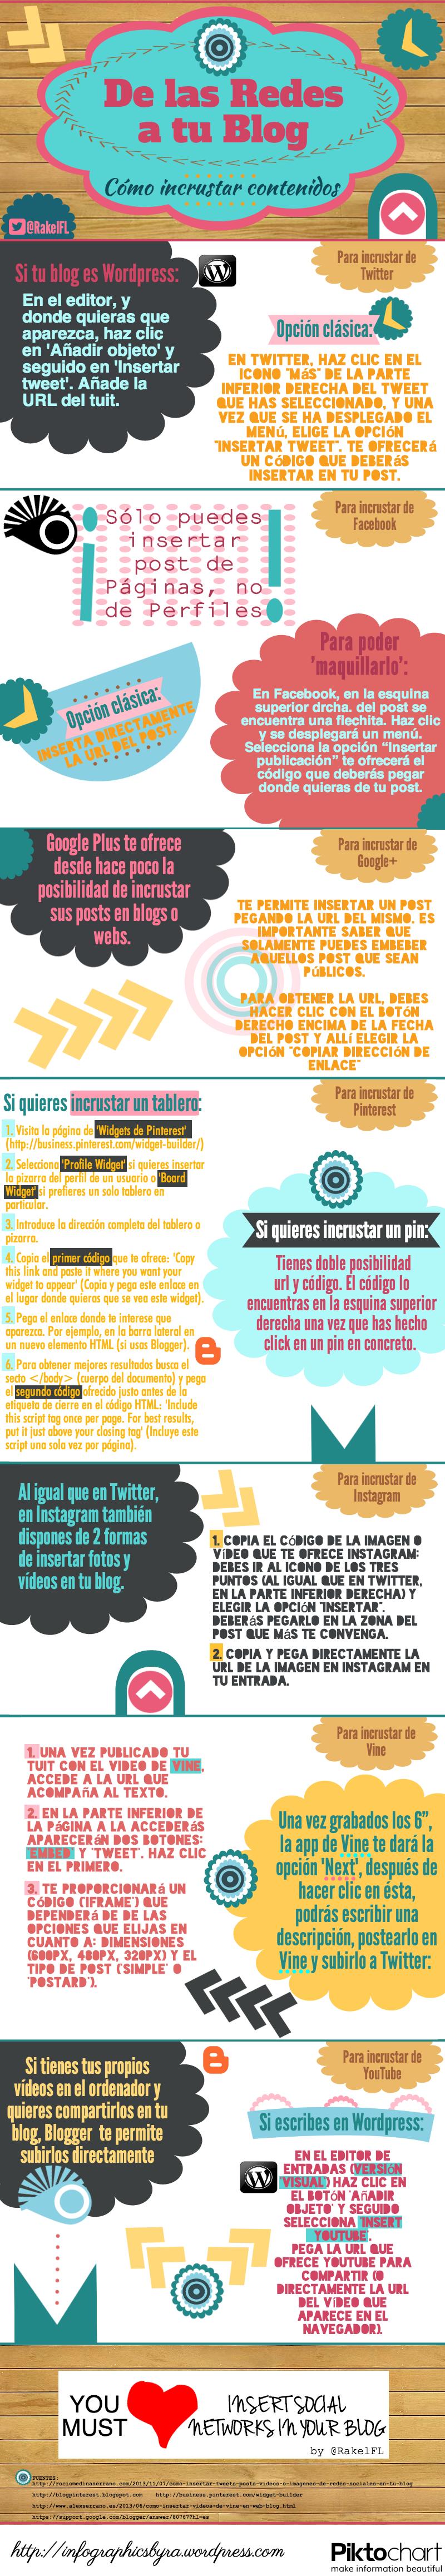 de-las-redes-a-tu-blog-infografc3ada-by-rakel-felipe